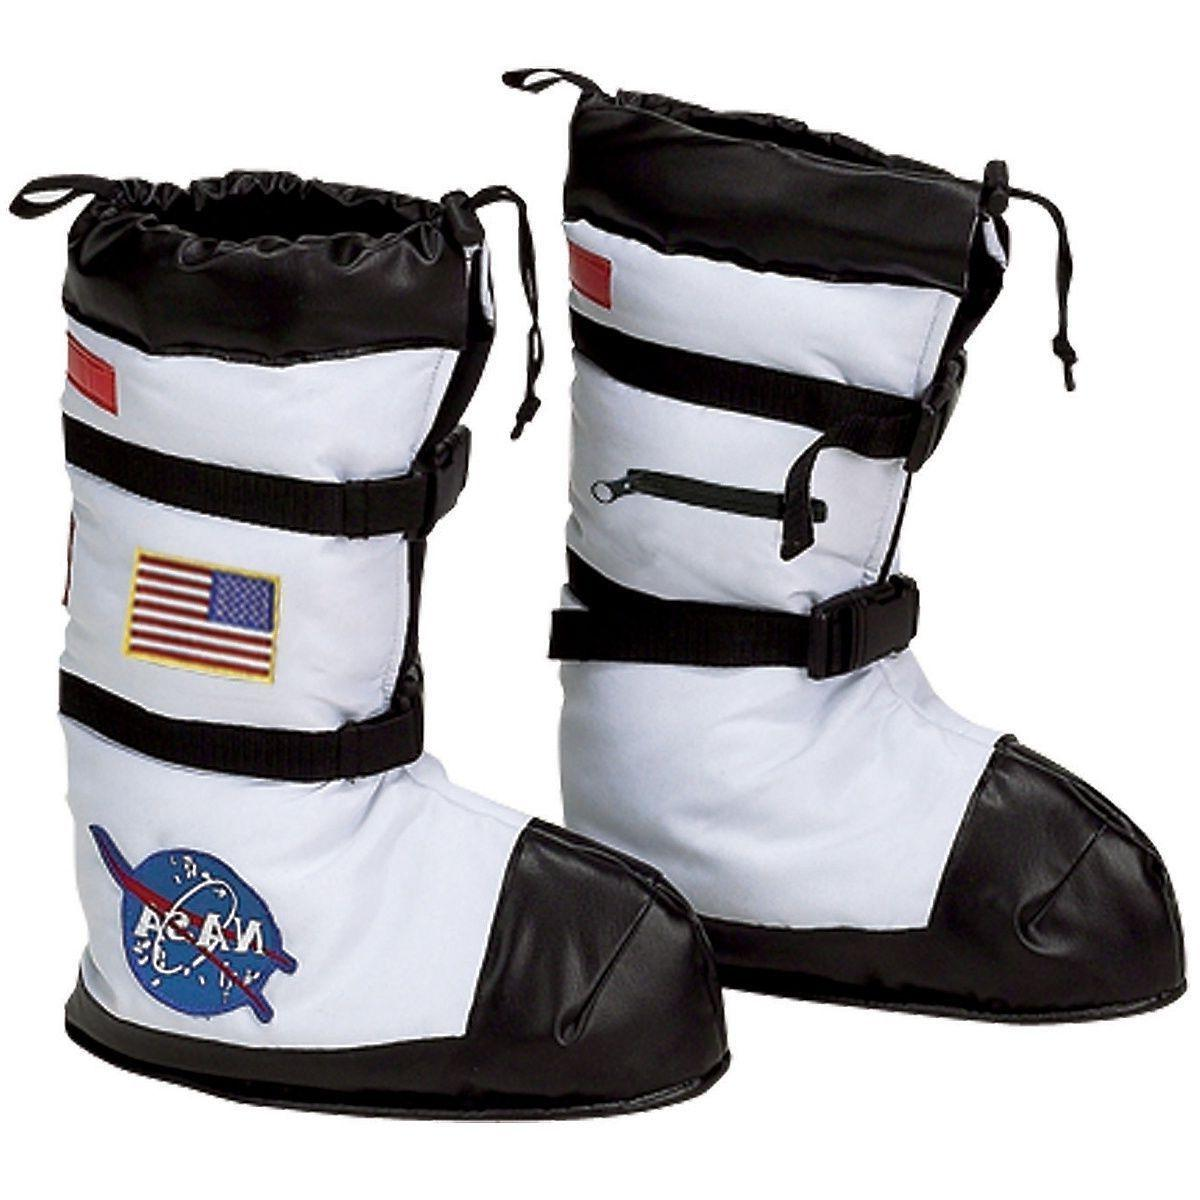 Child Astronaut Boots Astronaut Space Nasa Boot Aeromax Cost